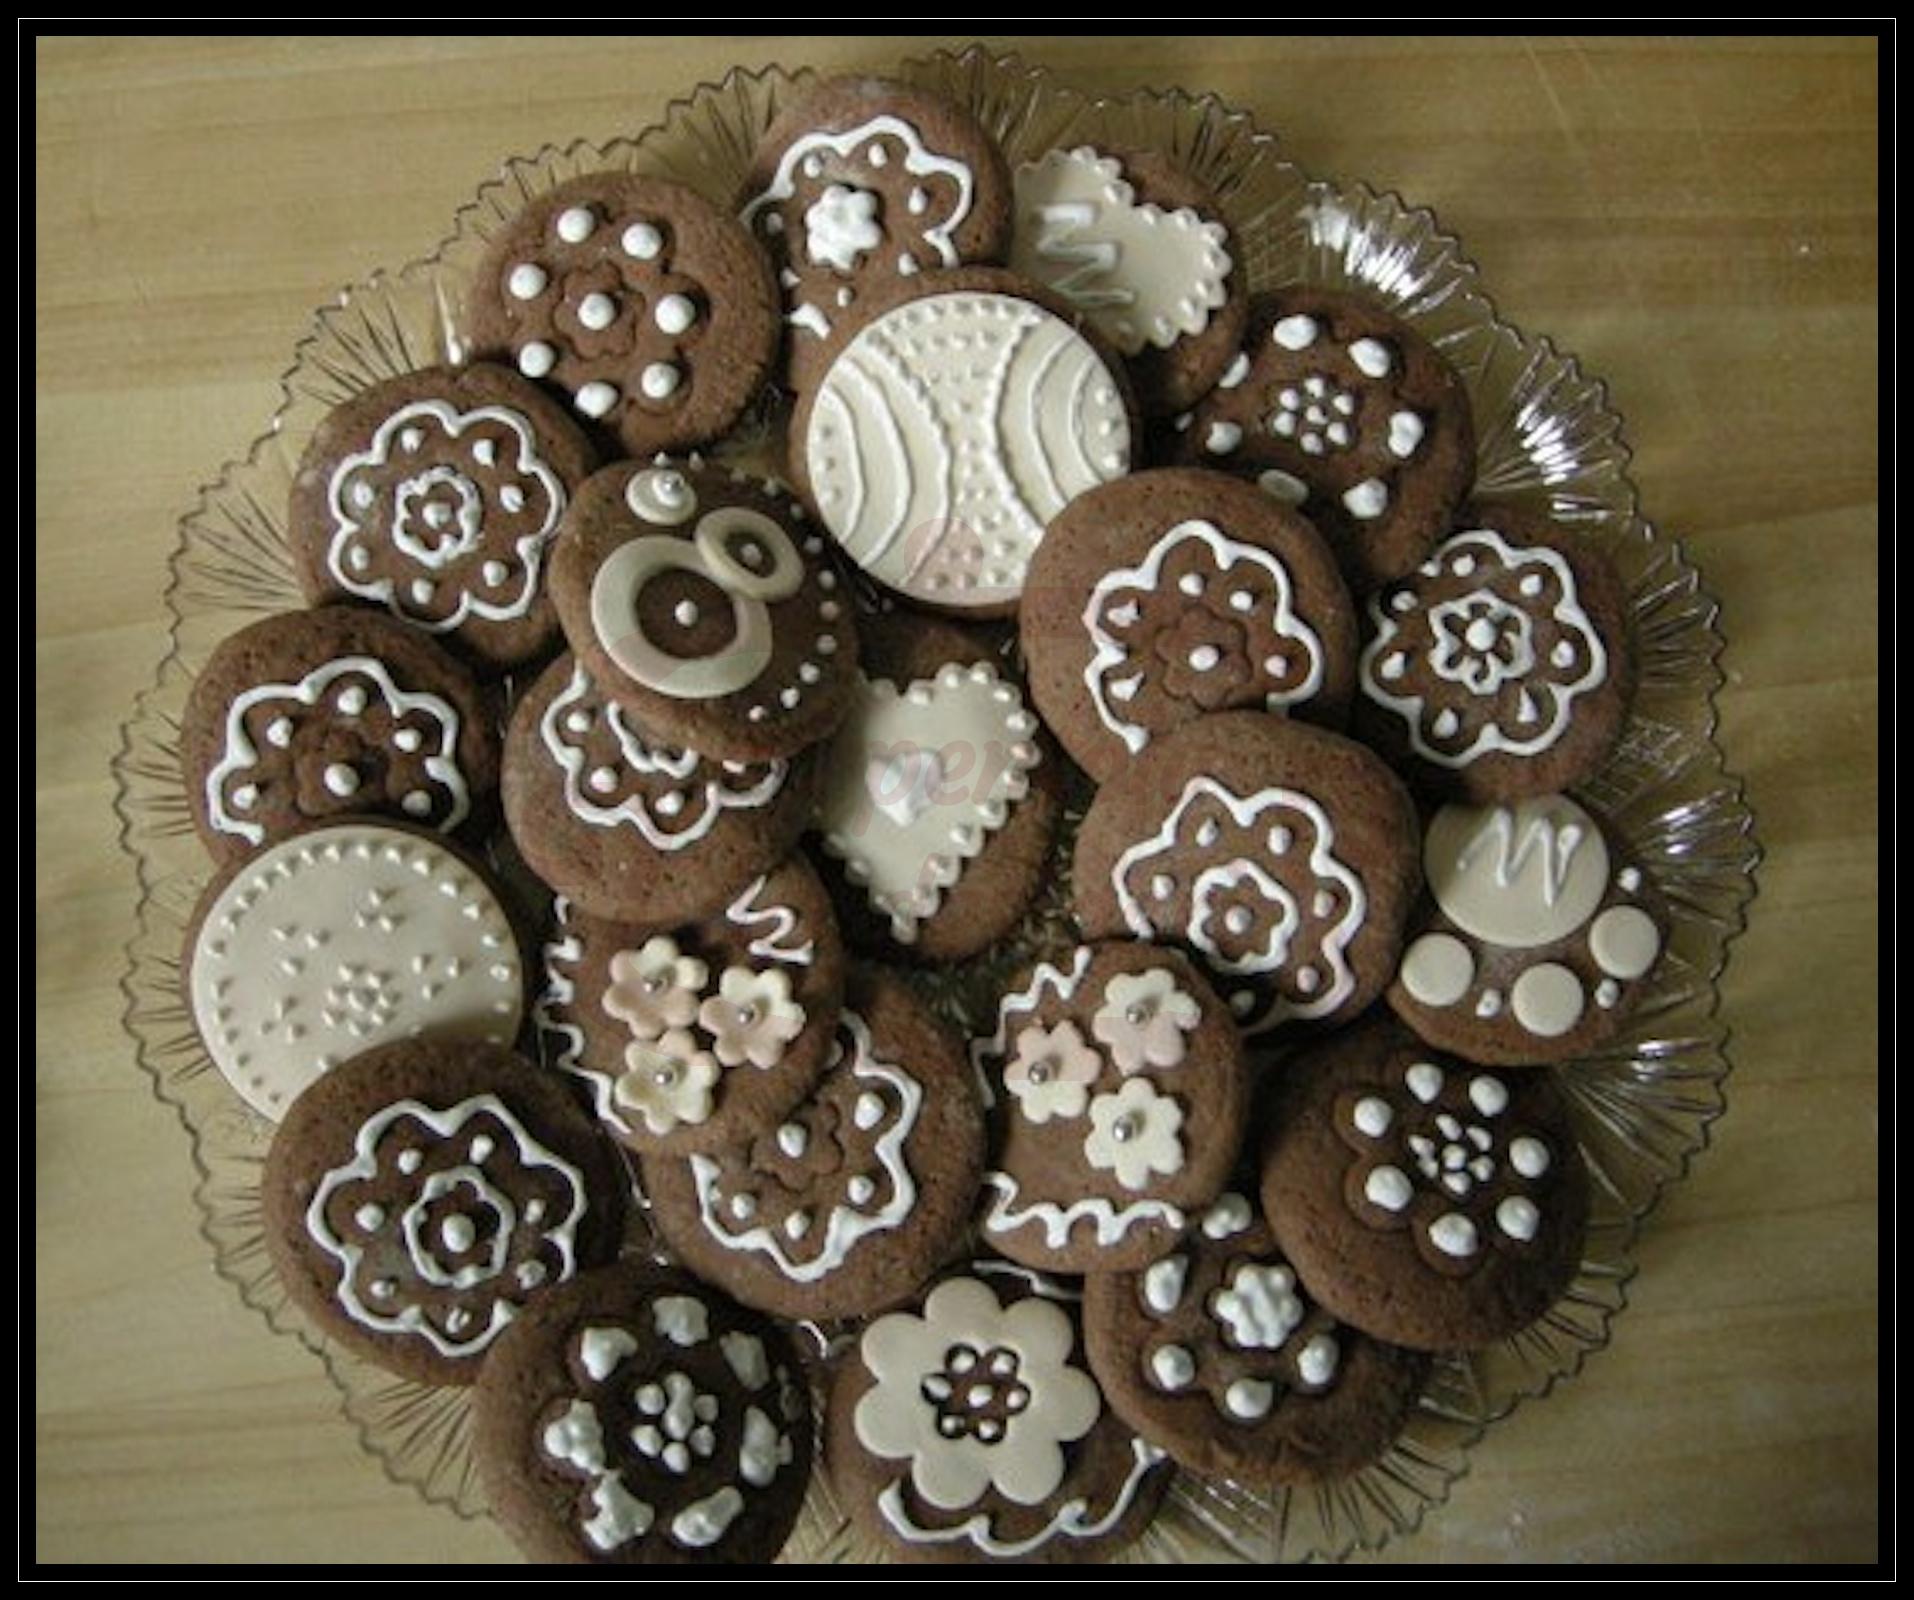 Biscottini al cacao e caffè